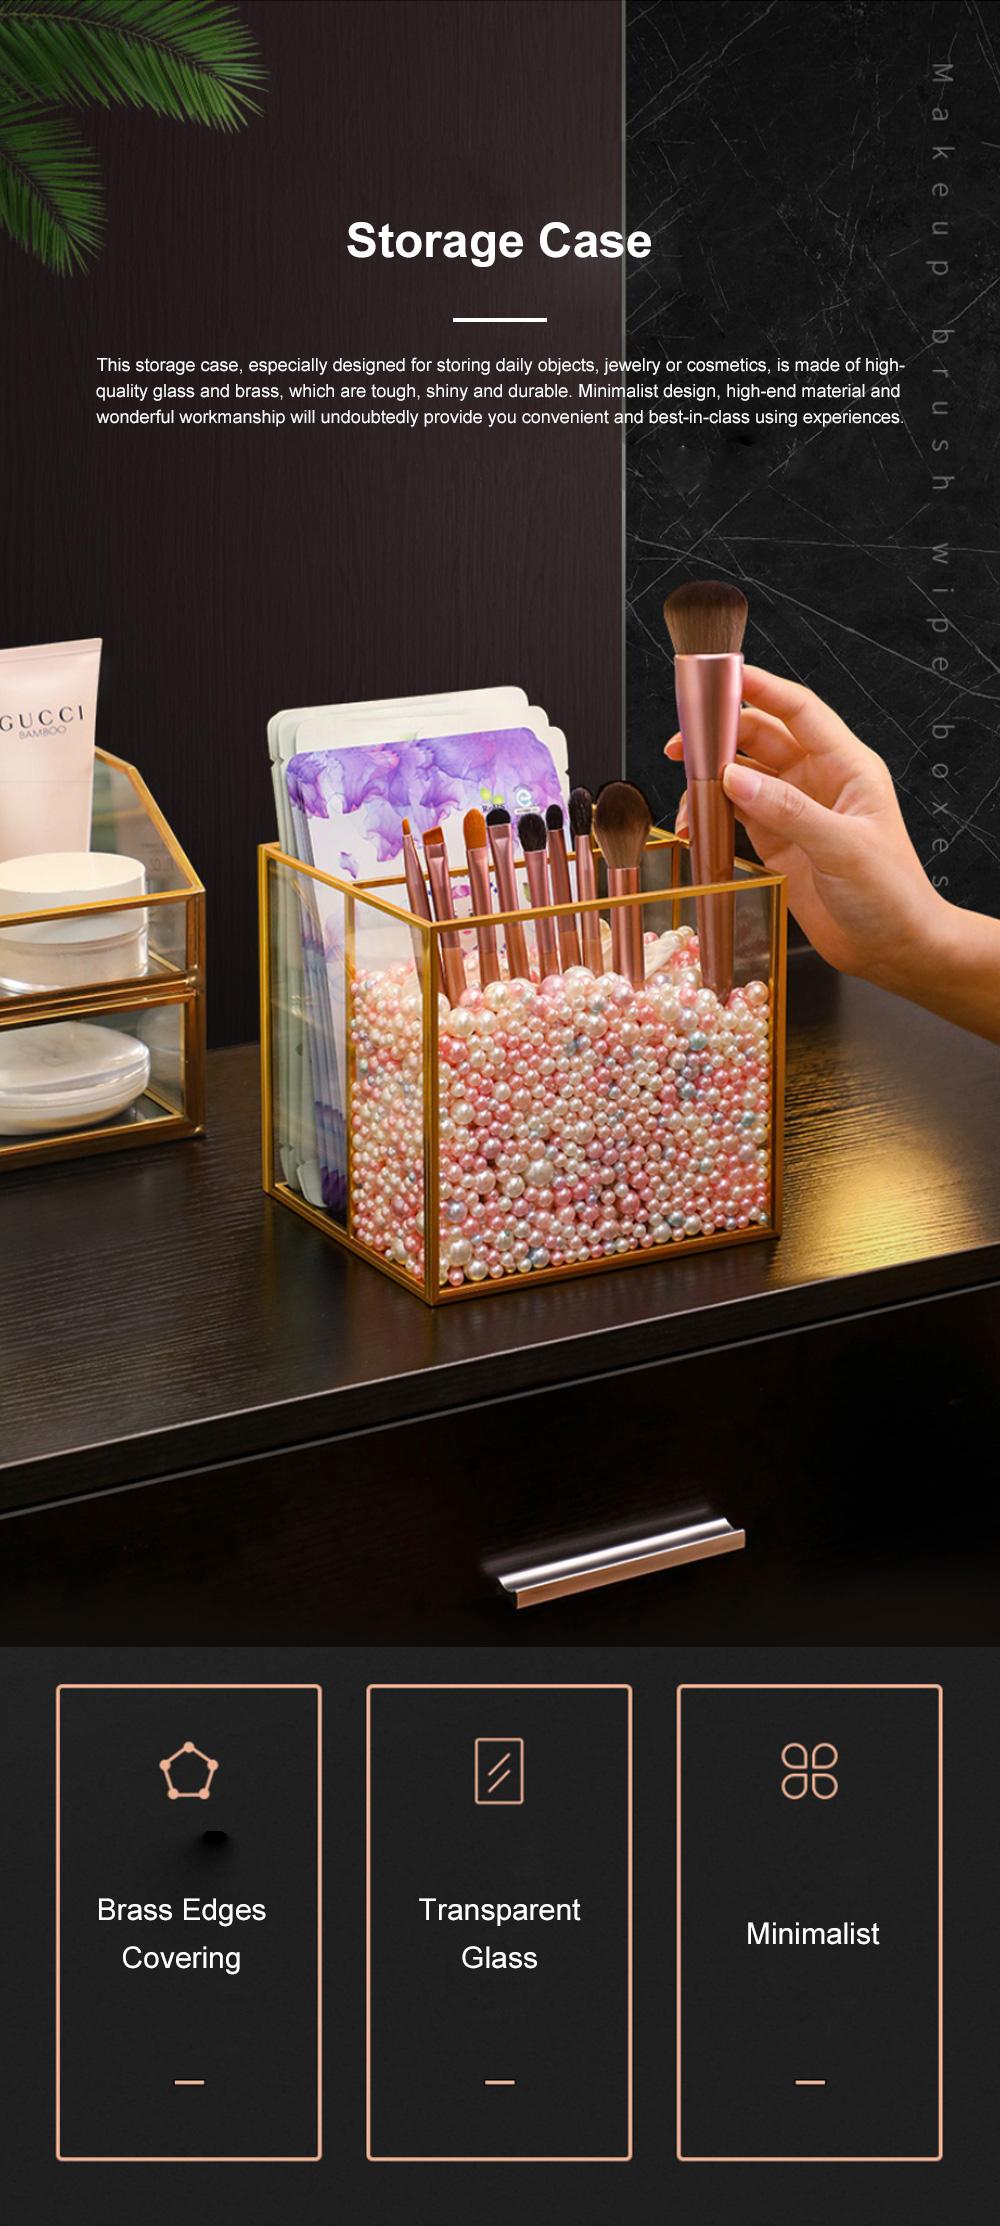 Stylish Minimalist Transparent Glass Desktop Storage Rack Jewelry Cosmetics Brushes Storage Case Box Household 0